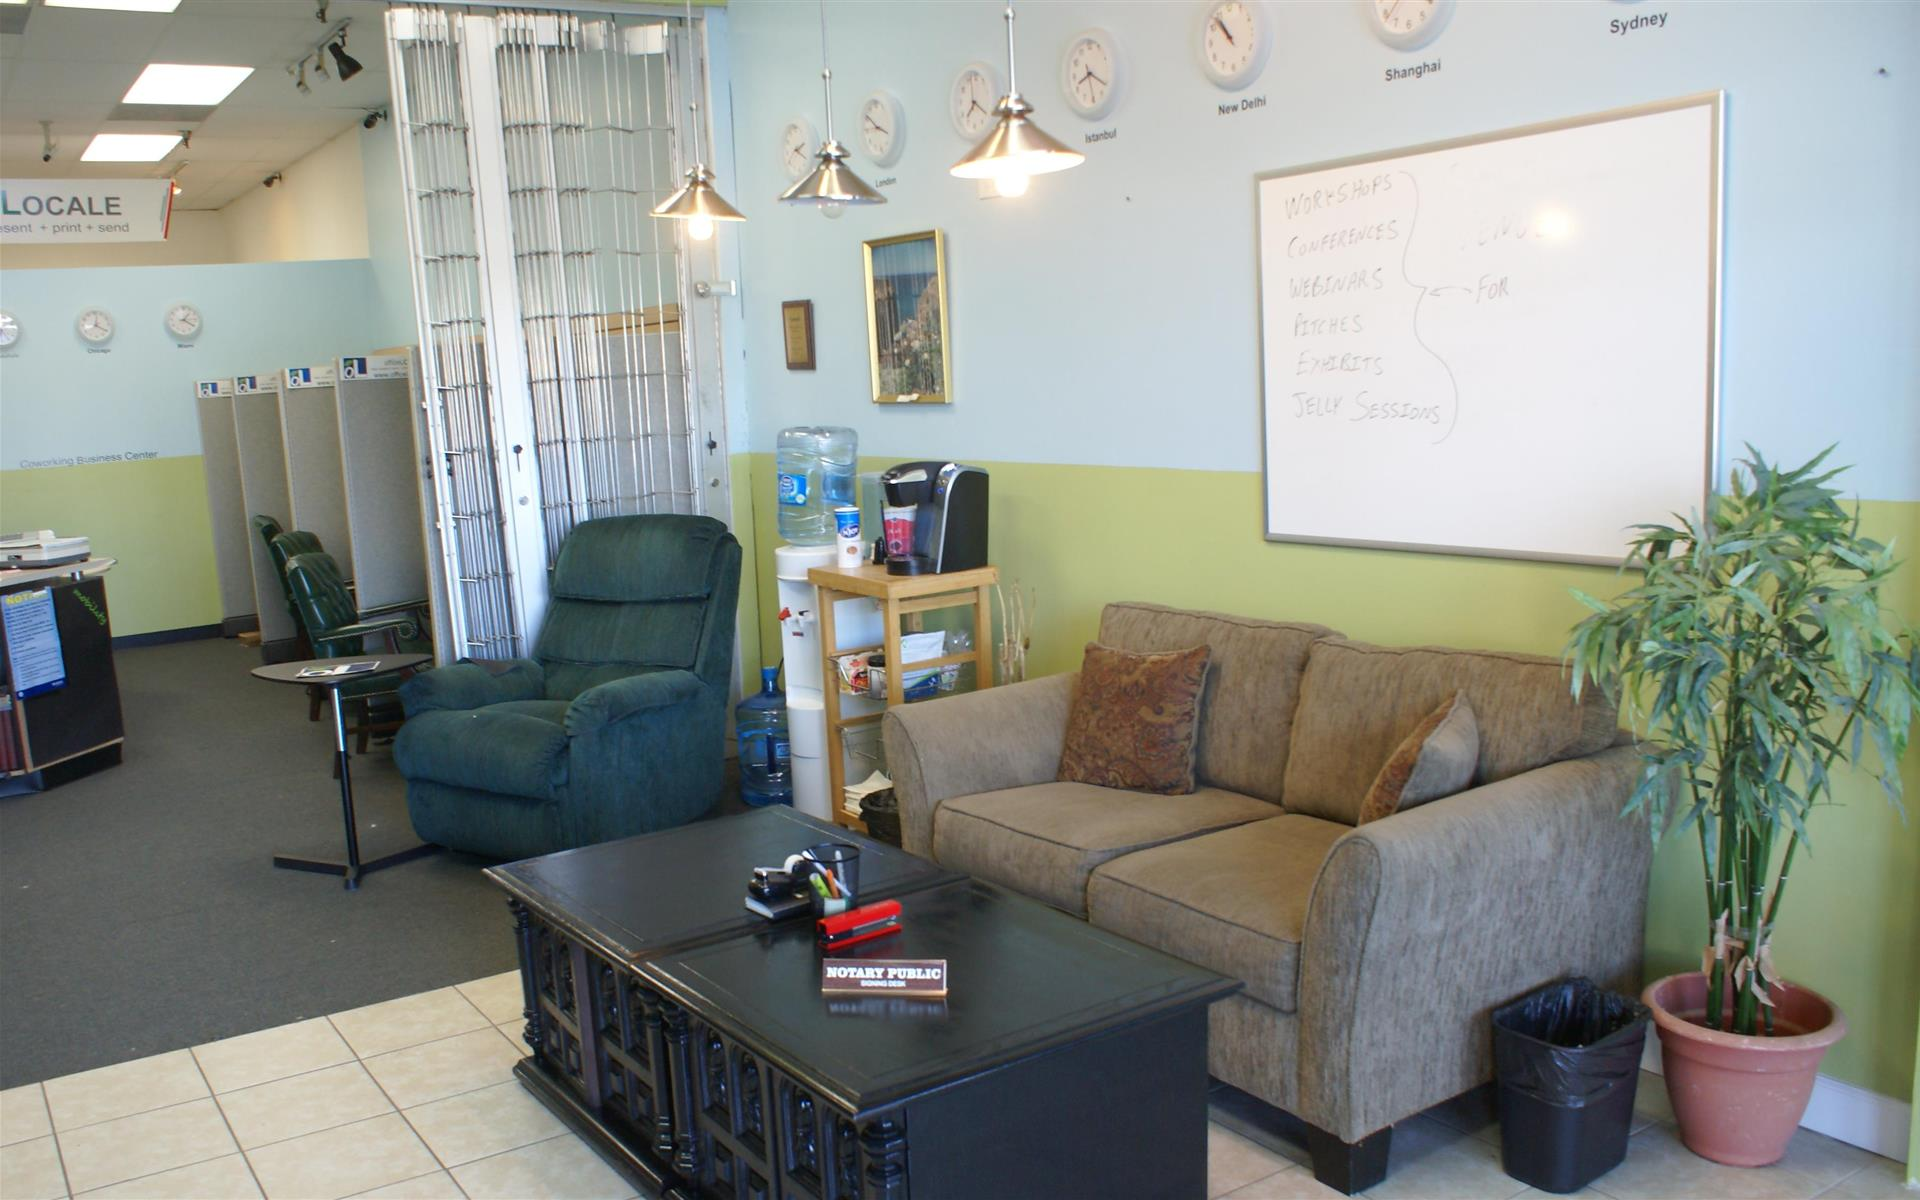 officeLOCALE Coworking Space & Cyberscraper - Lobby Area